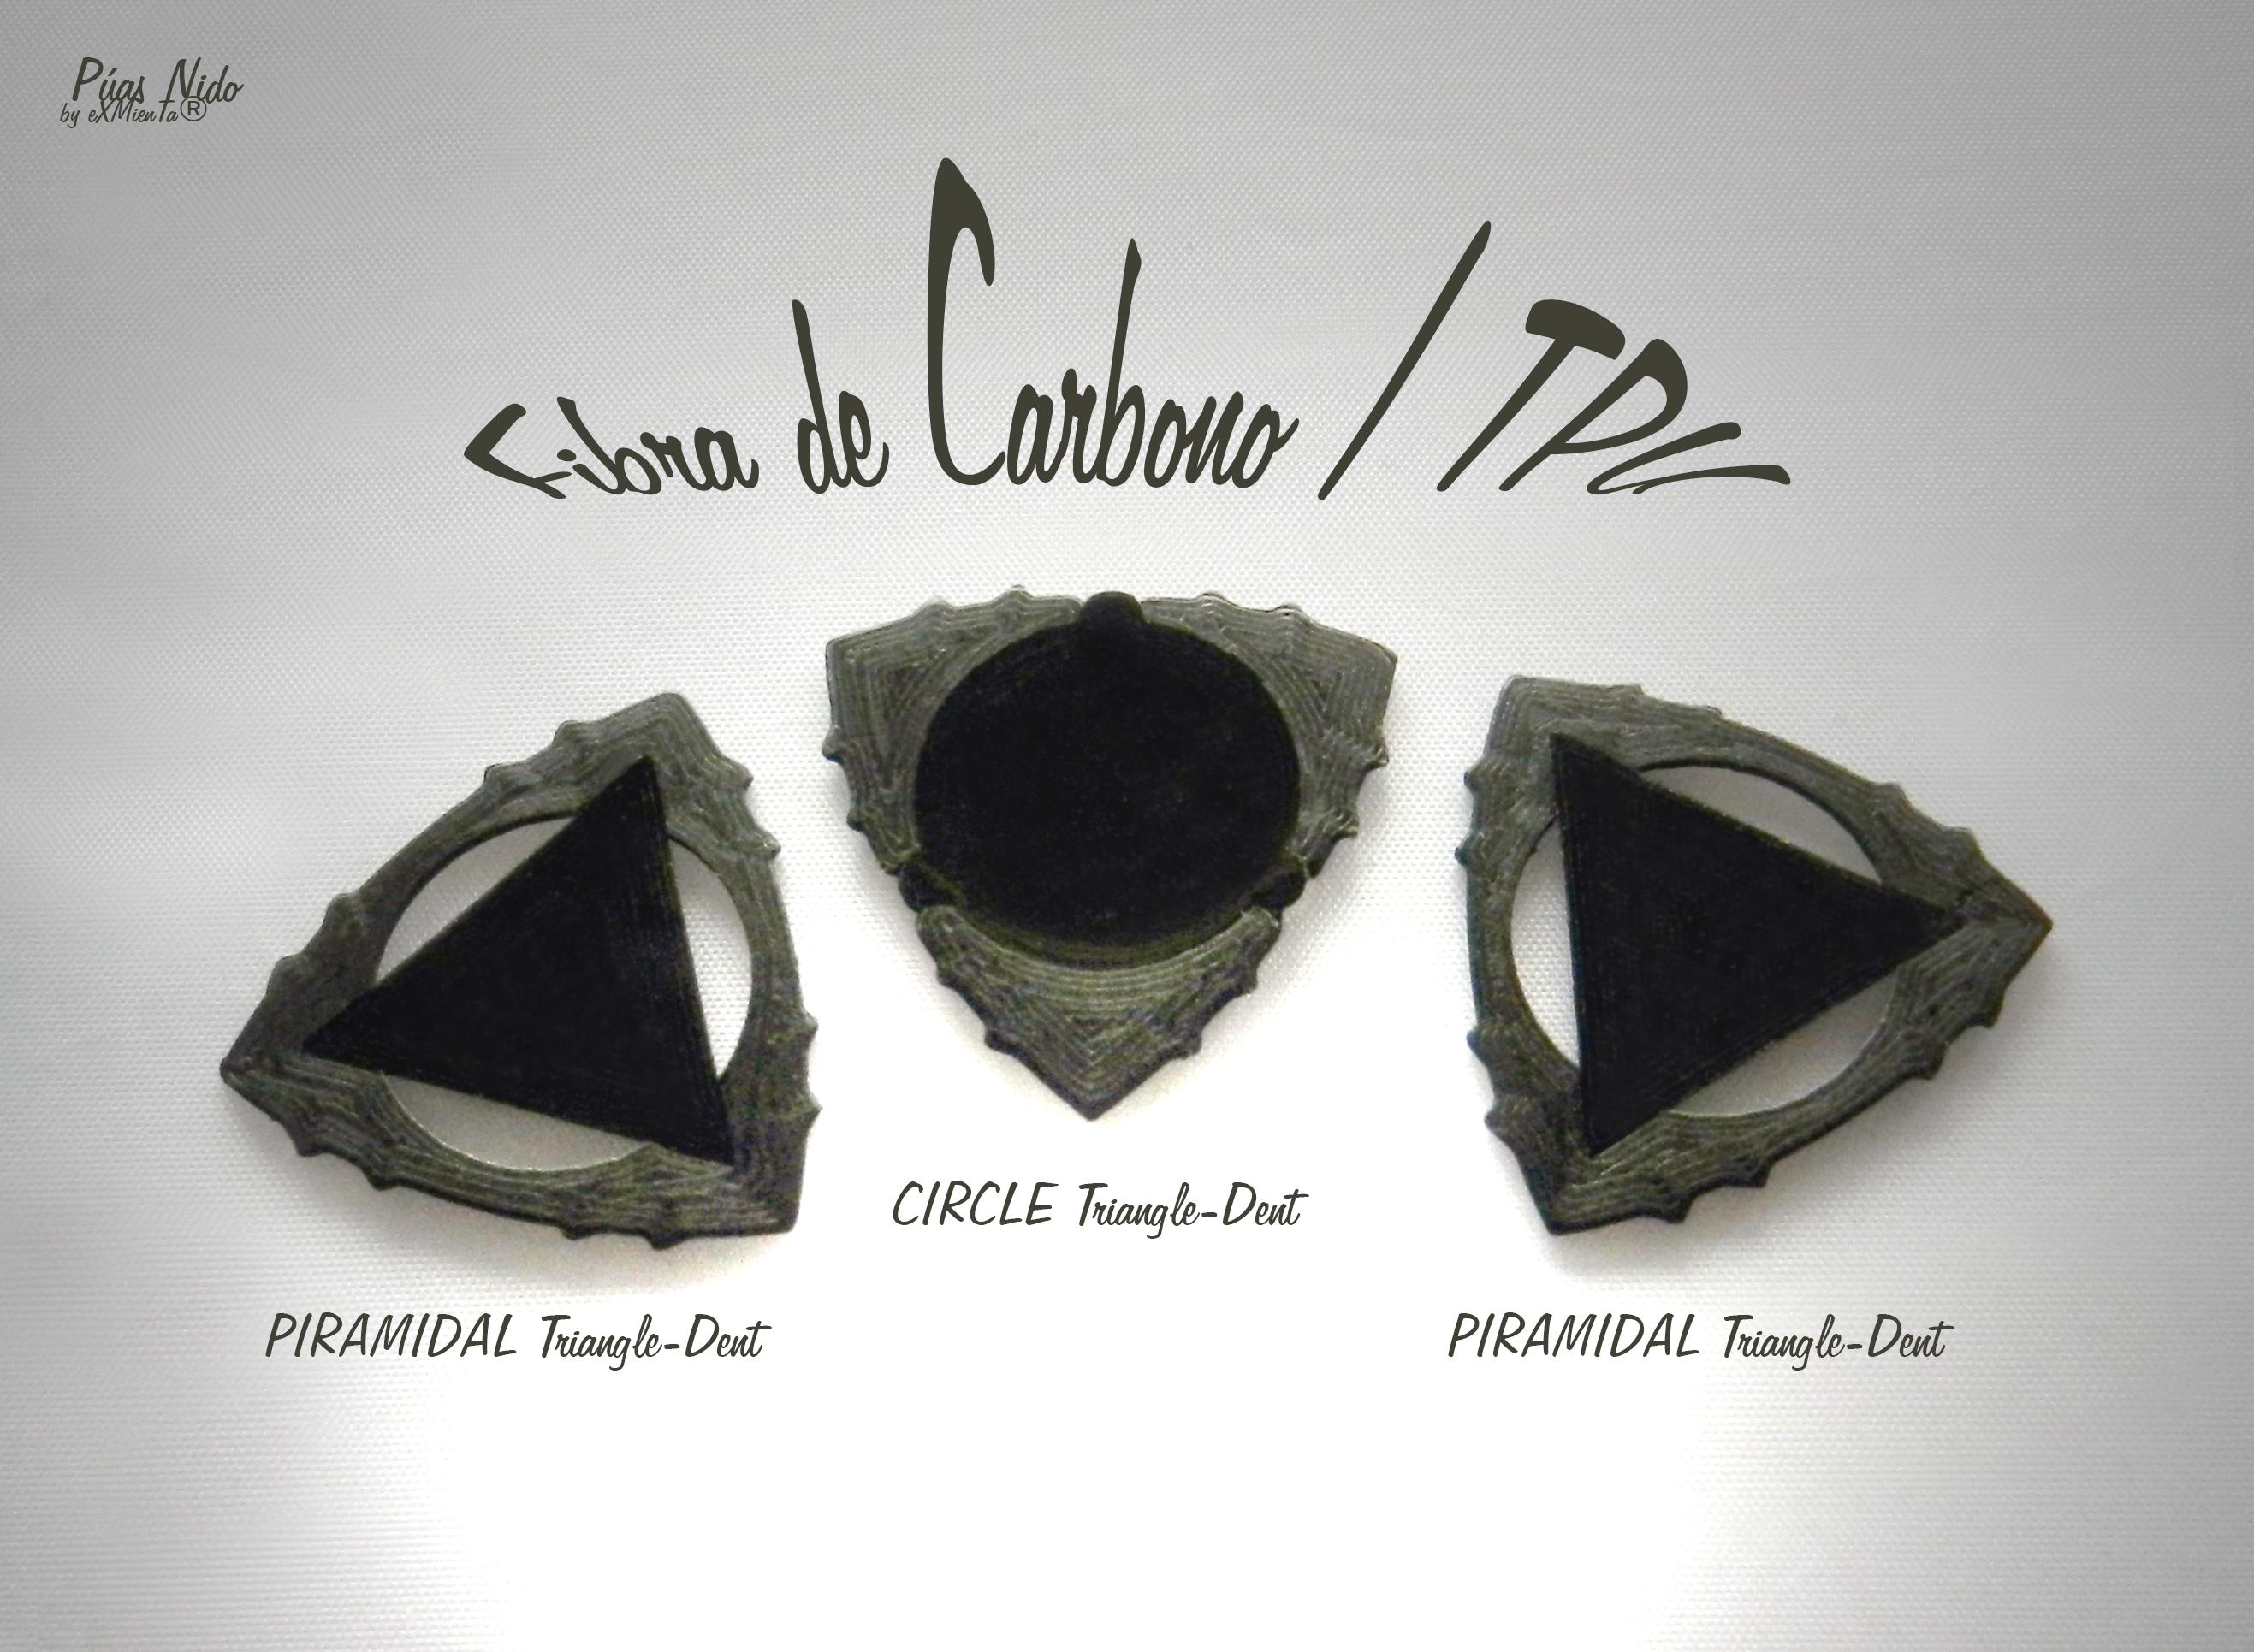 Triangle-Dent Circle'Piramidal.jpg Download free STL file Triangle-Dent Circle'Piramidal - Electric Guitar Stick & Bass • 3D printer template, carleslluisar